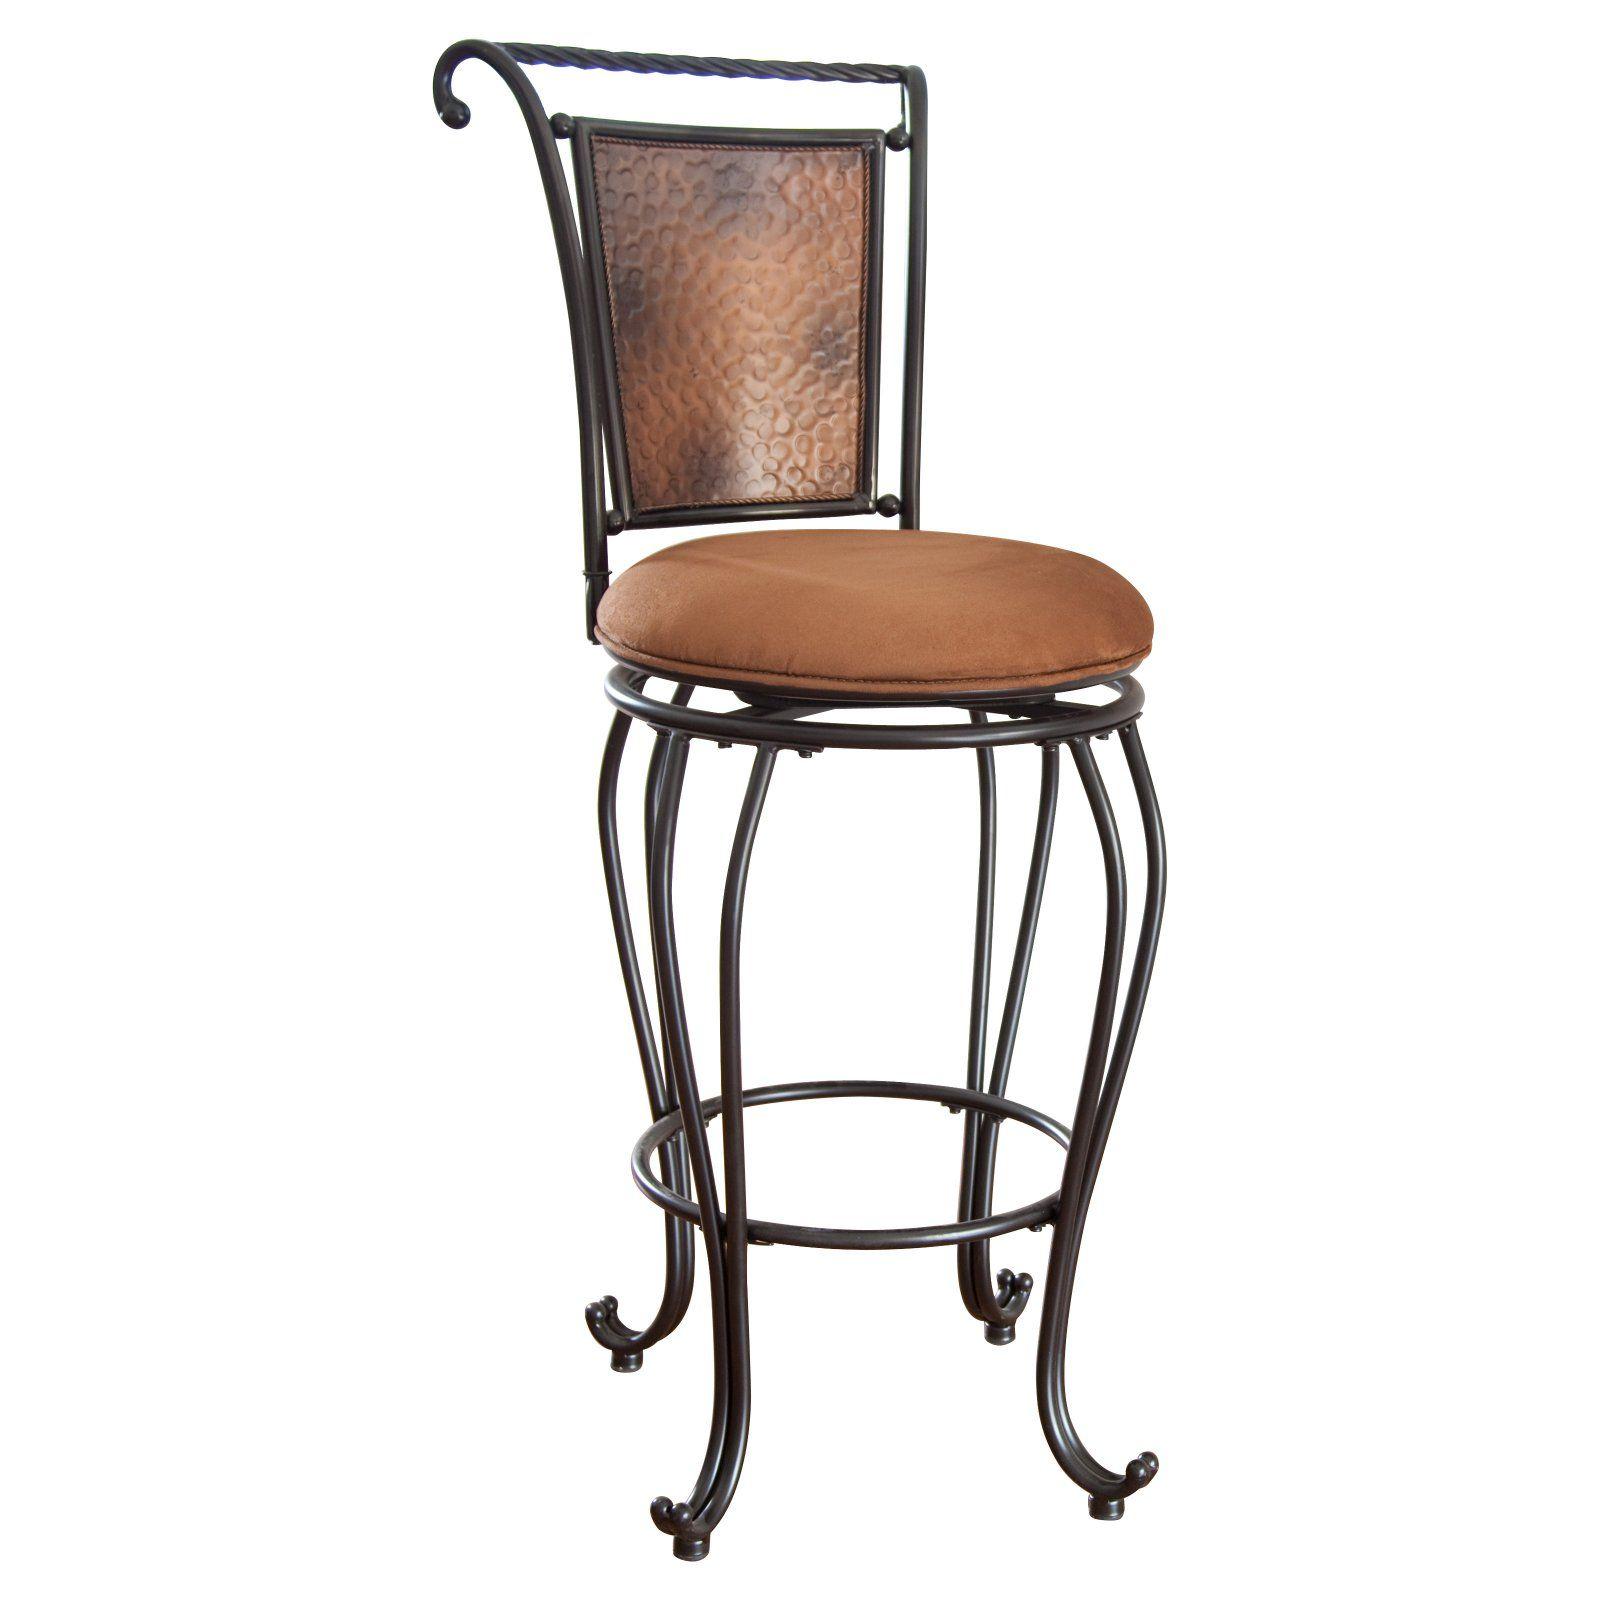 Hillsdale Milan 30 in. Swivel Bar Stool Bar stools